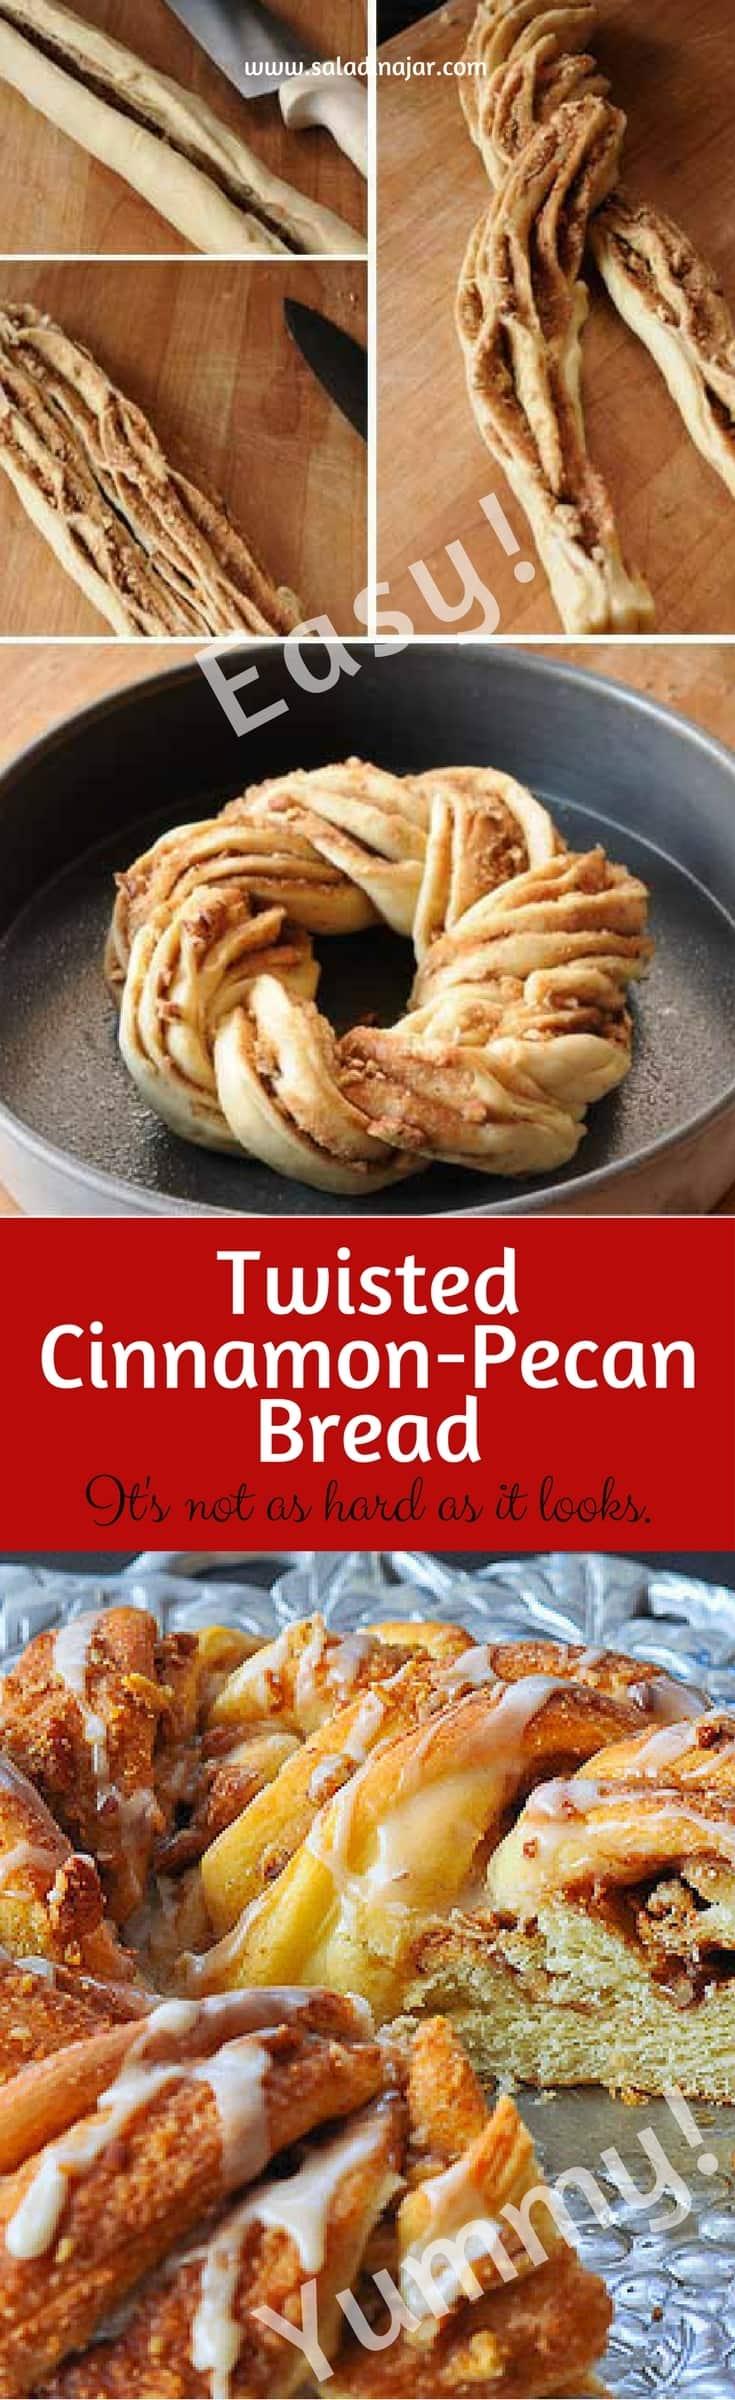 Twisted Cinnamon-Pecan Bread